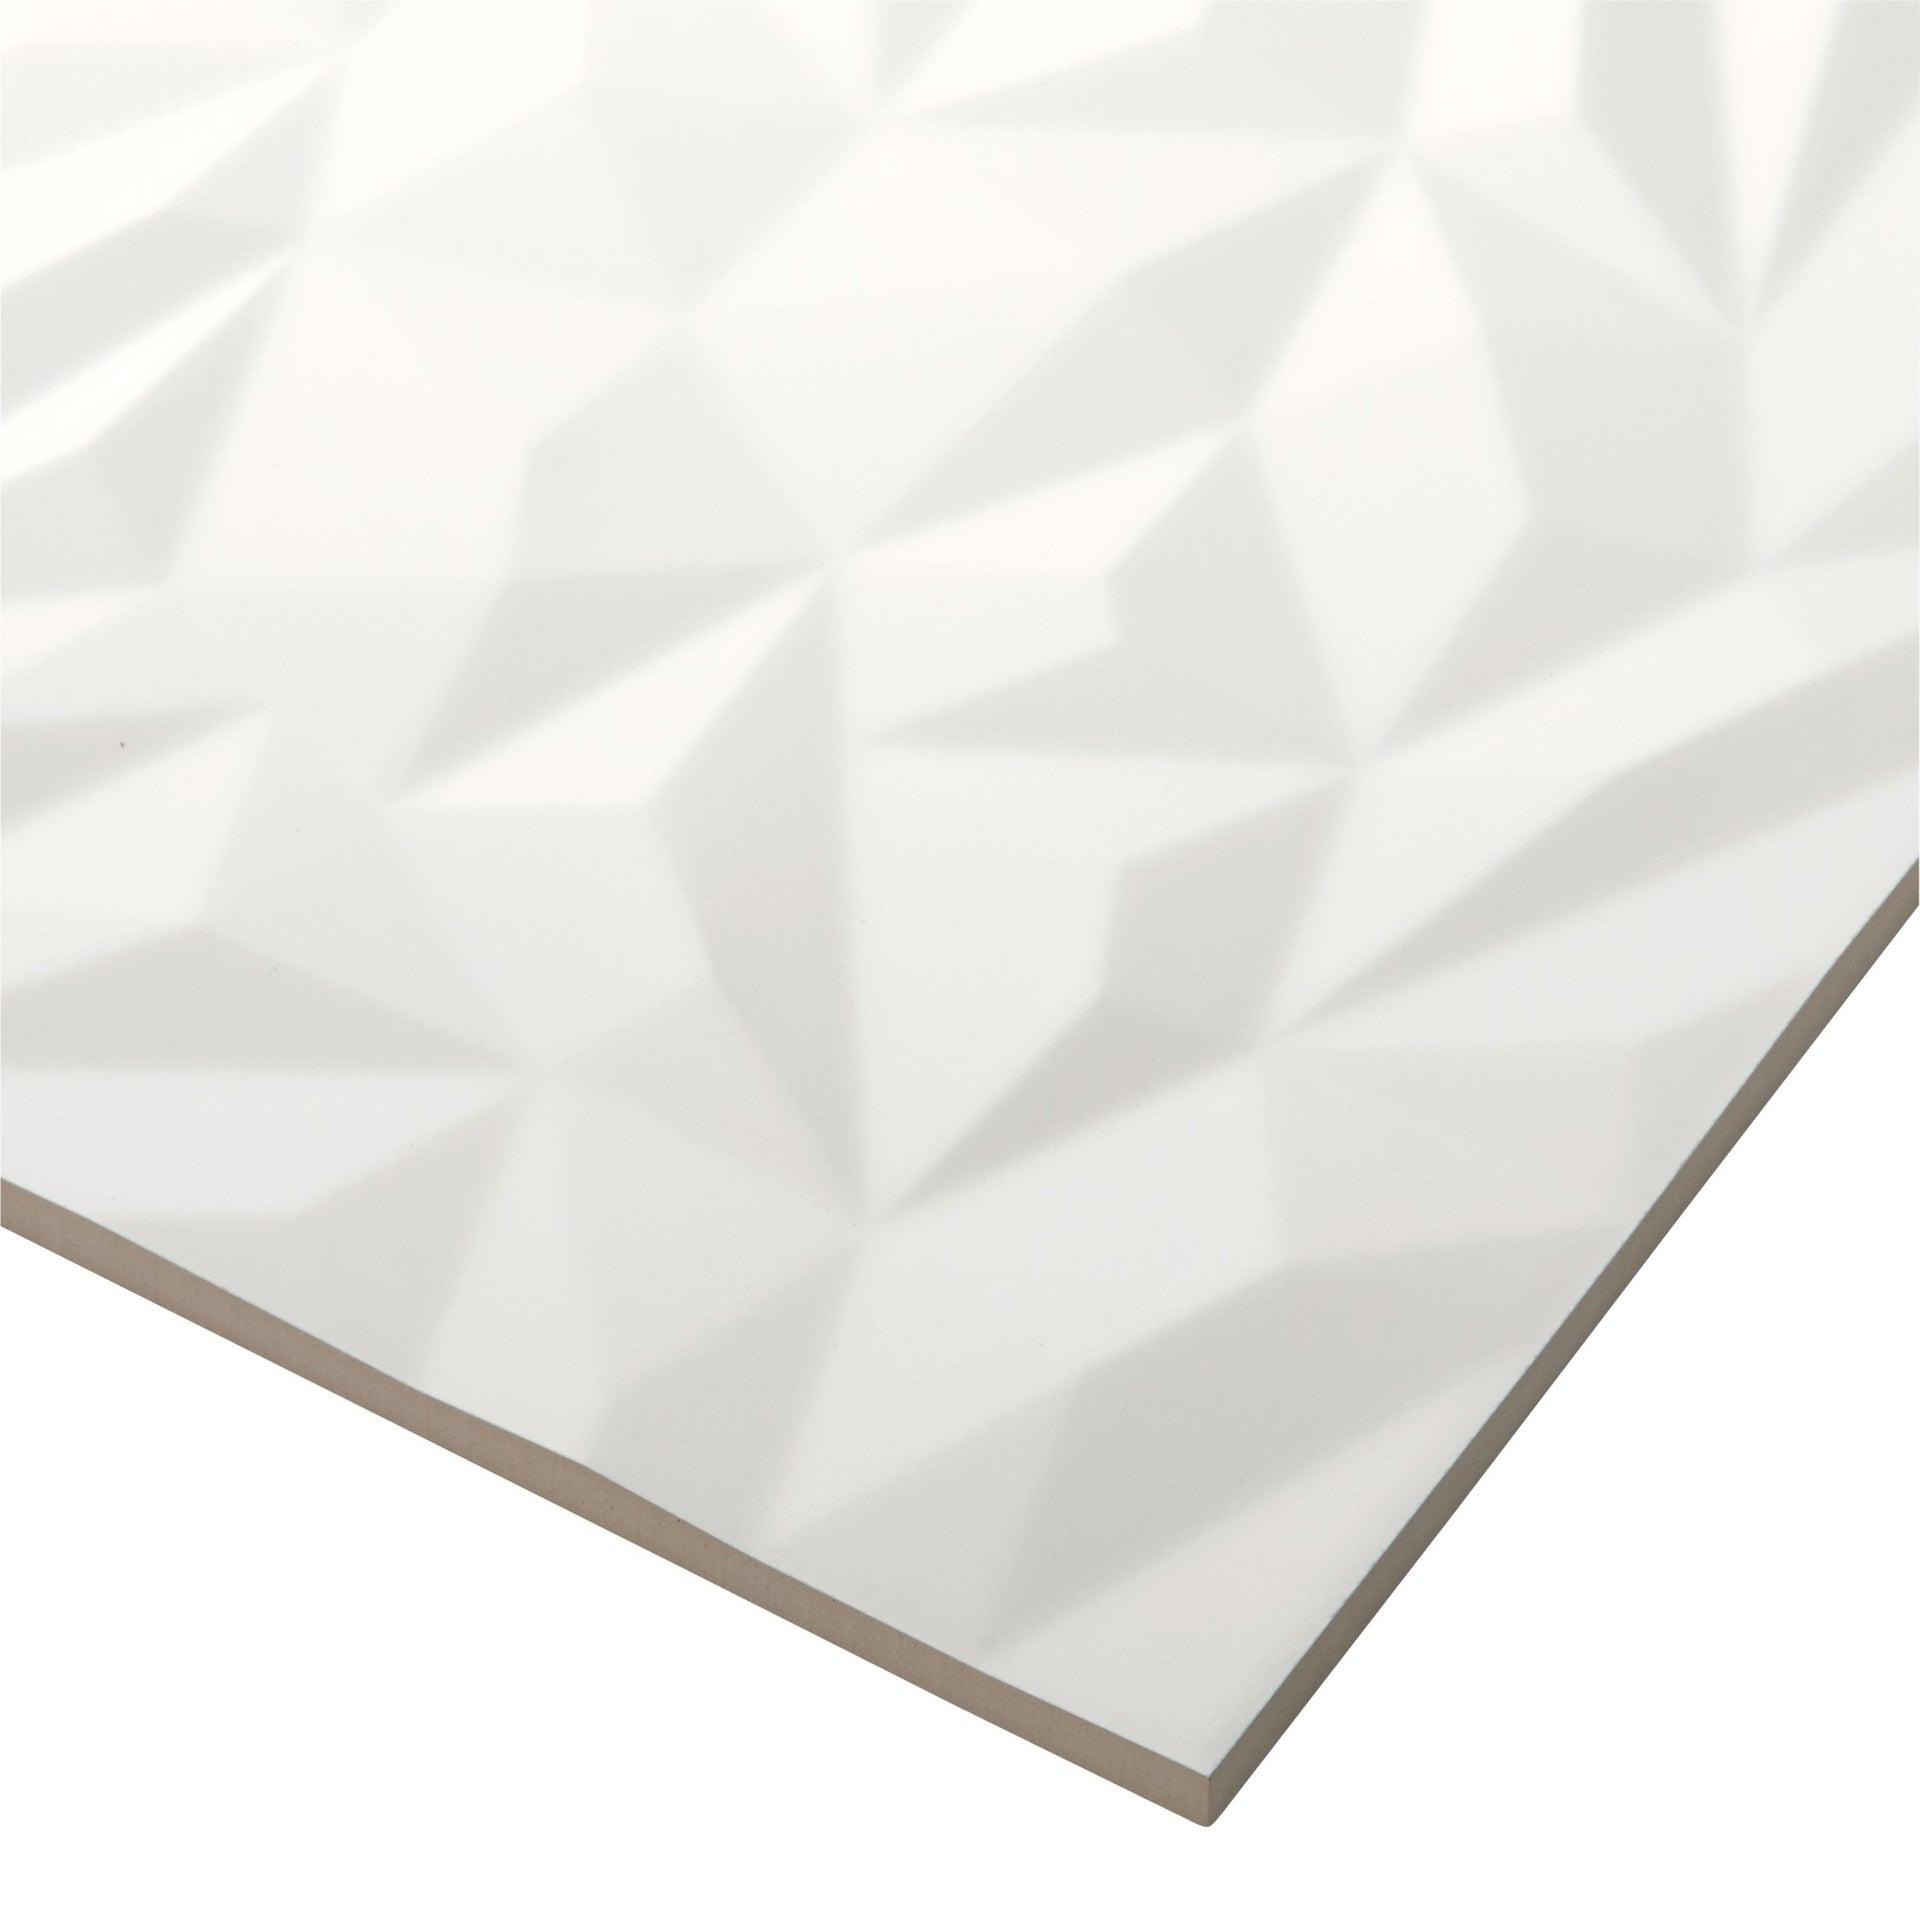 Piastrella per rivestimenti Arctic 30 x 90 cm sp. 10 mm bianco - 4